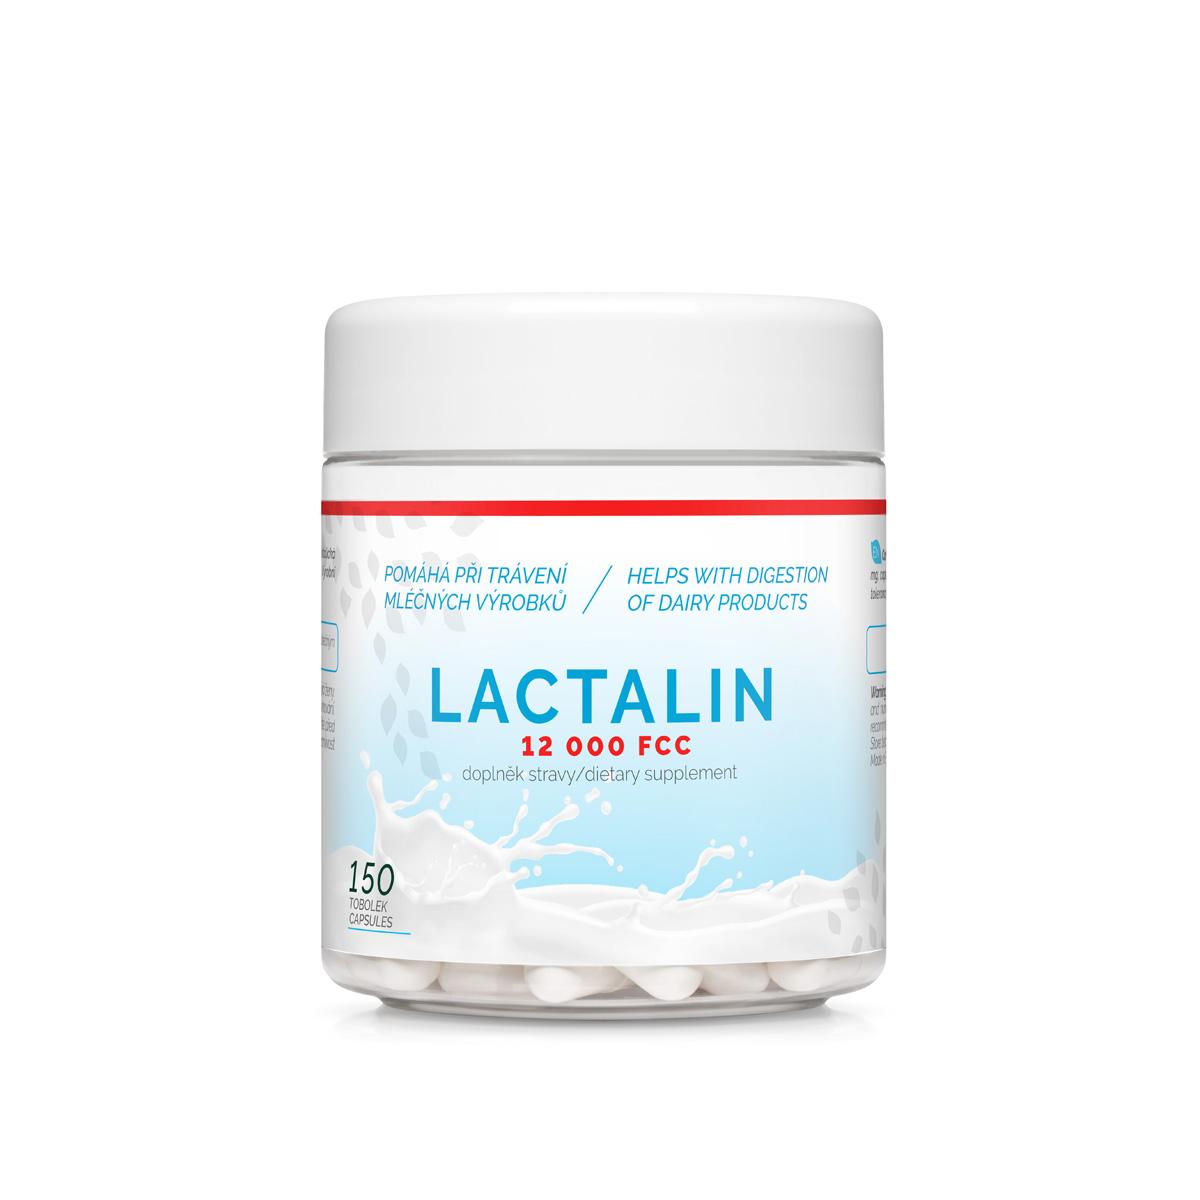 Lactalin 12000 FCC 150 cps